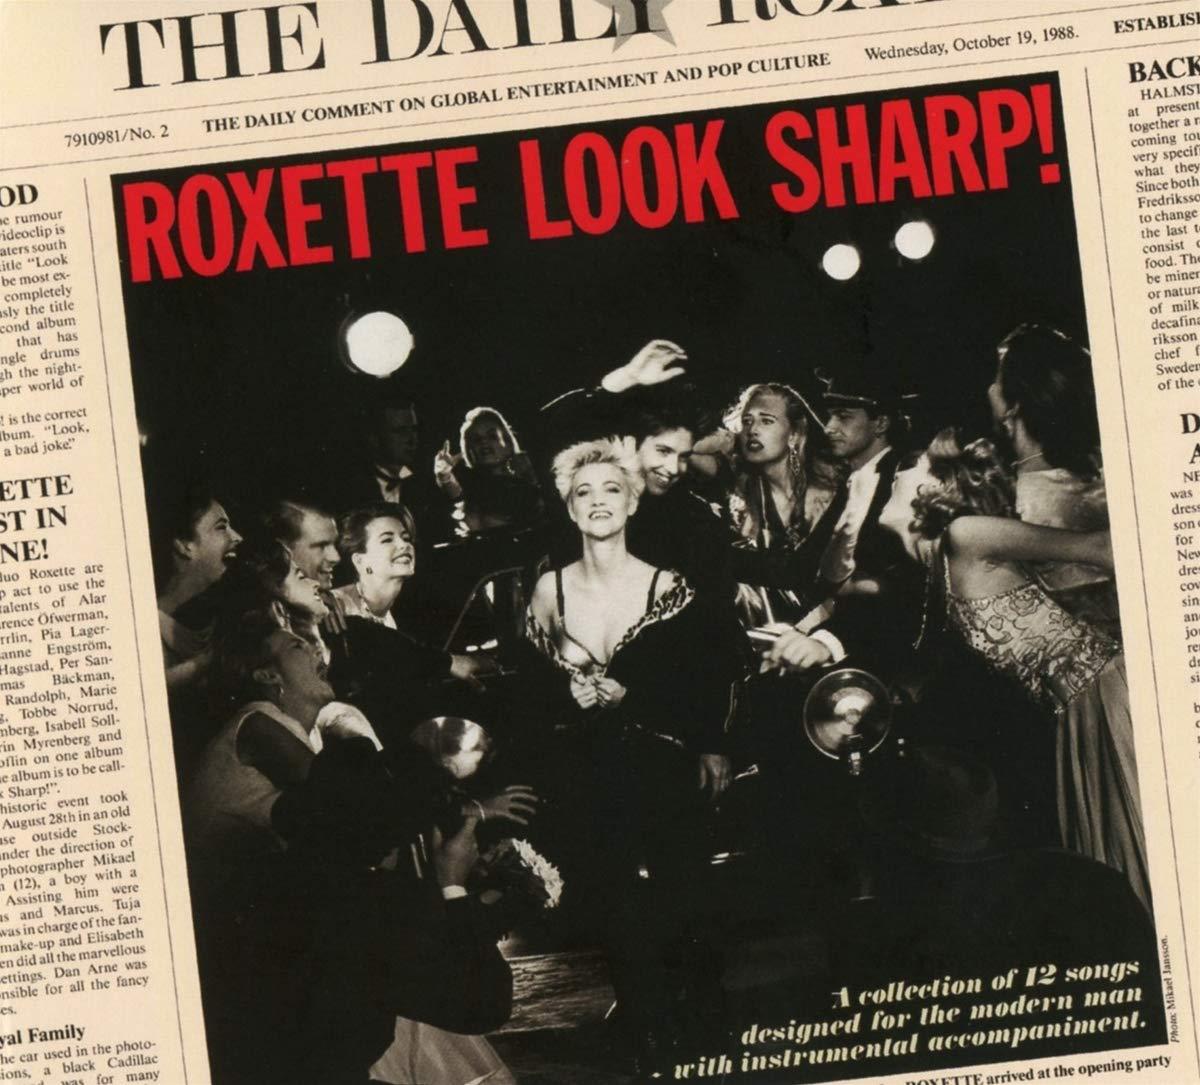 CD : Roxette - Look Sharp! (30th Anniversary Edition) (Canada - Import)